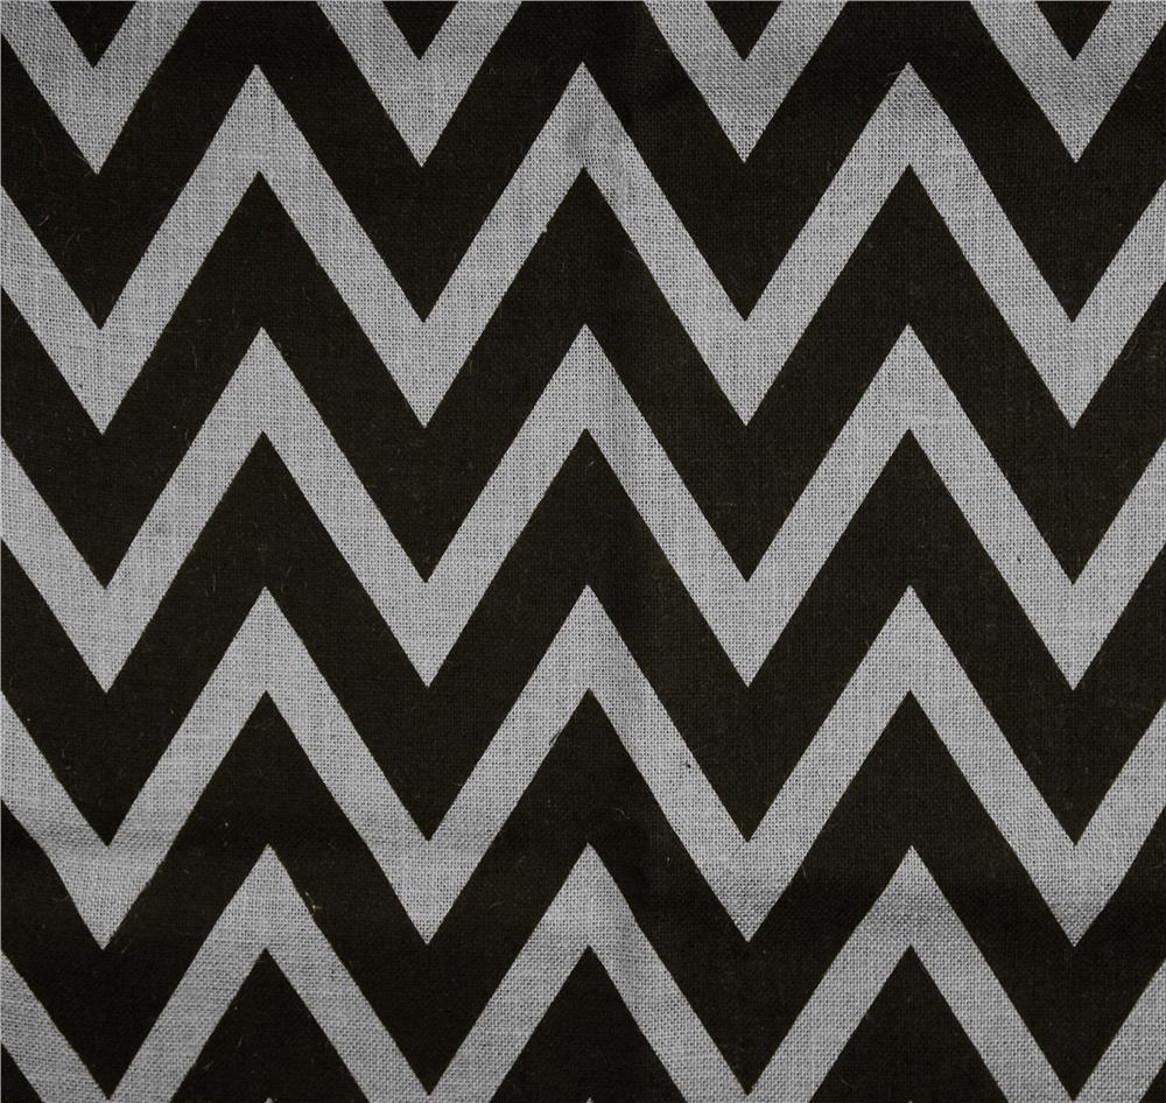 Light Grey Black Chevron Burlap 60 By The Yard Cbroll